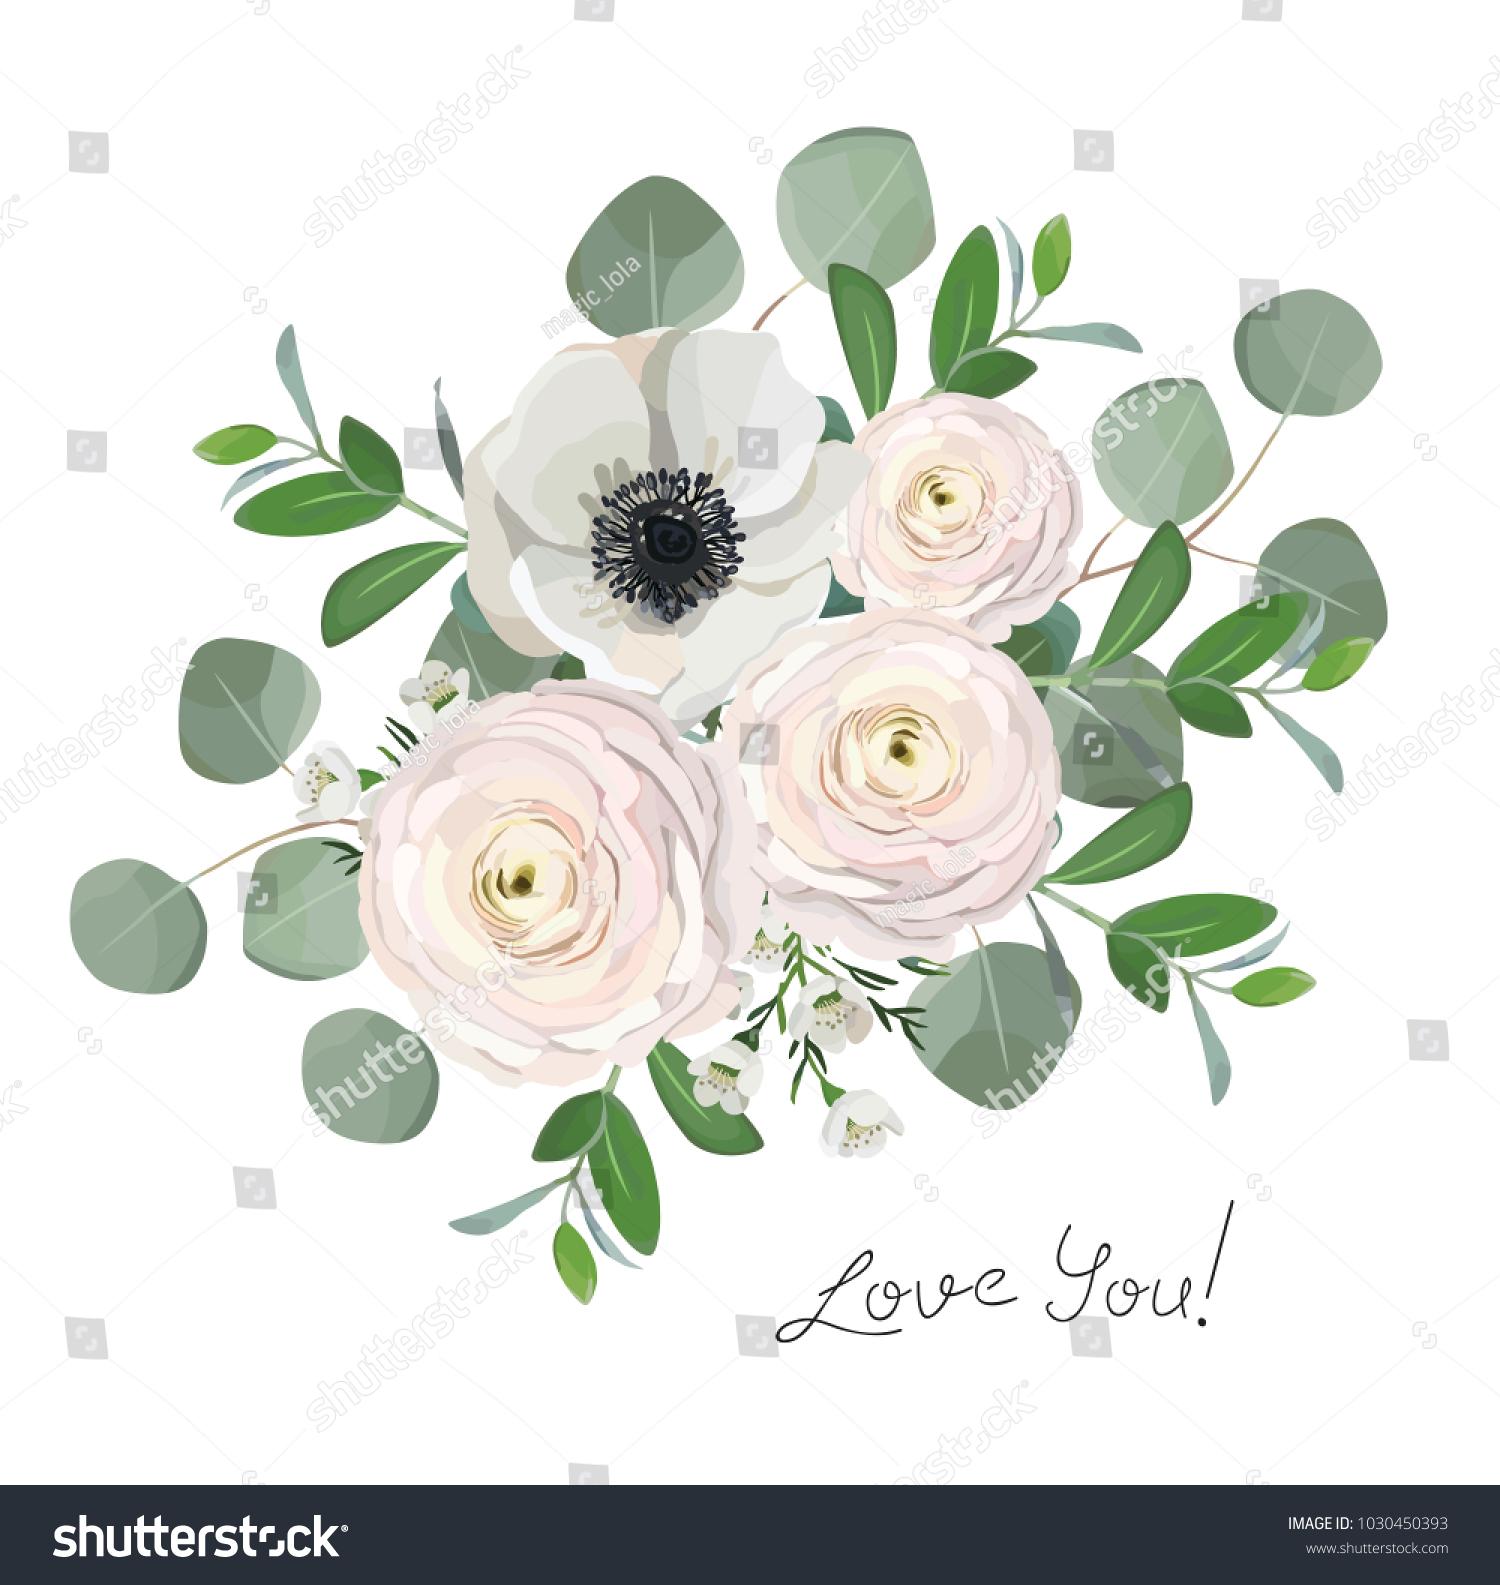 Ranunculus Anemone Eucalyptus Flowers Bouquet Illustration Stock Vector Royalty Free 1030450393